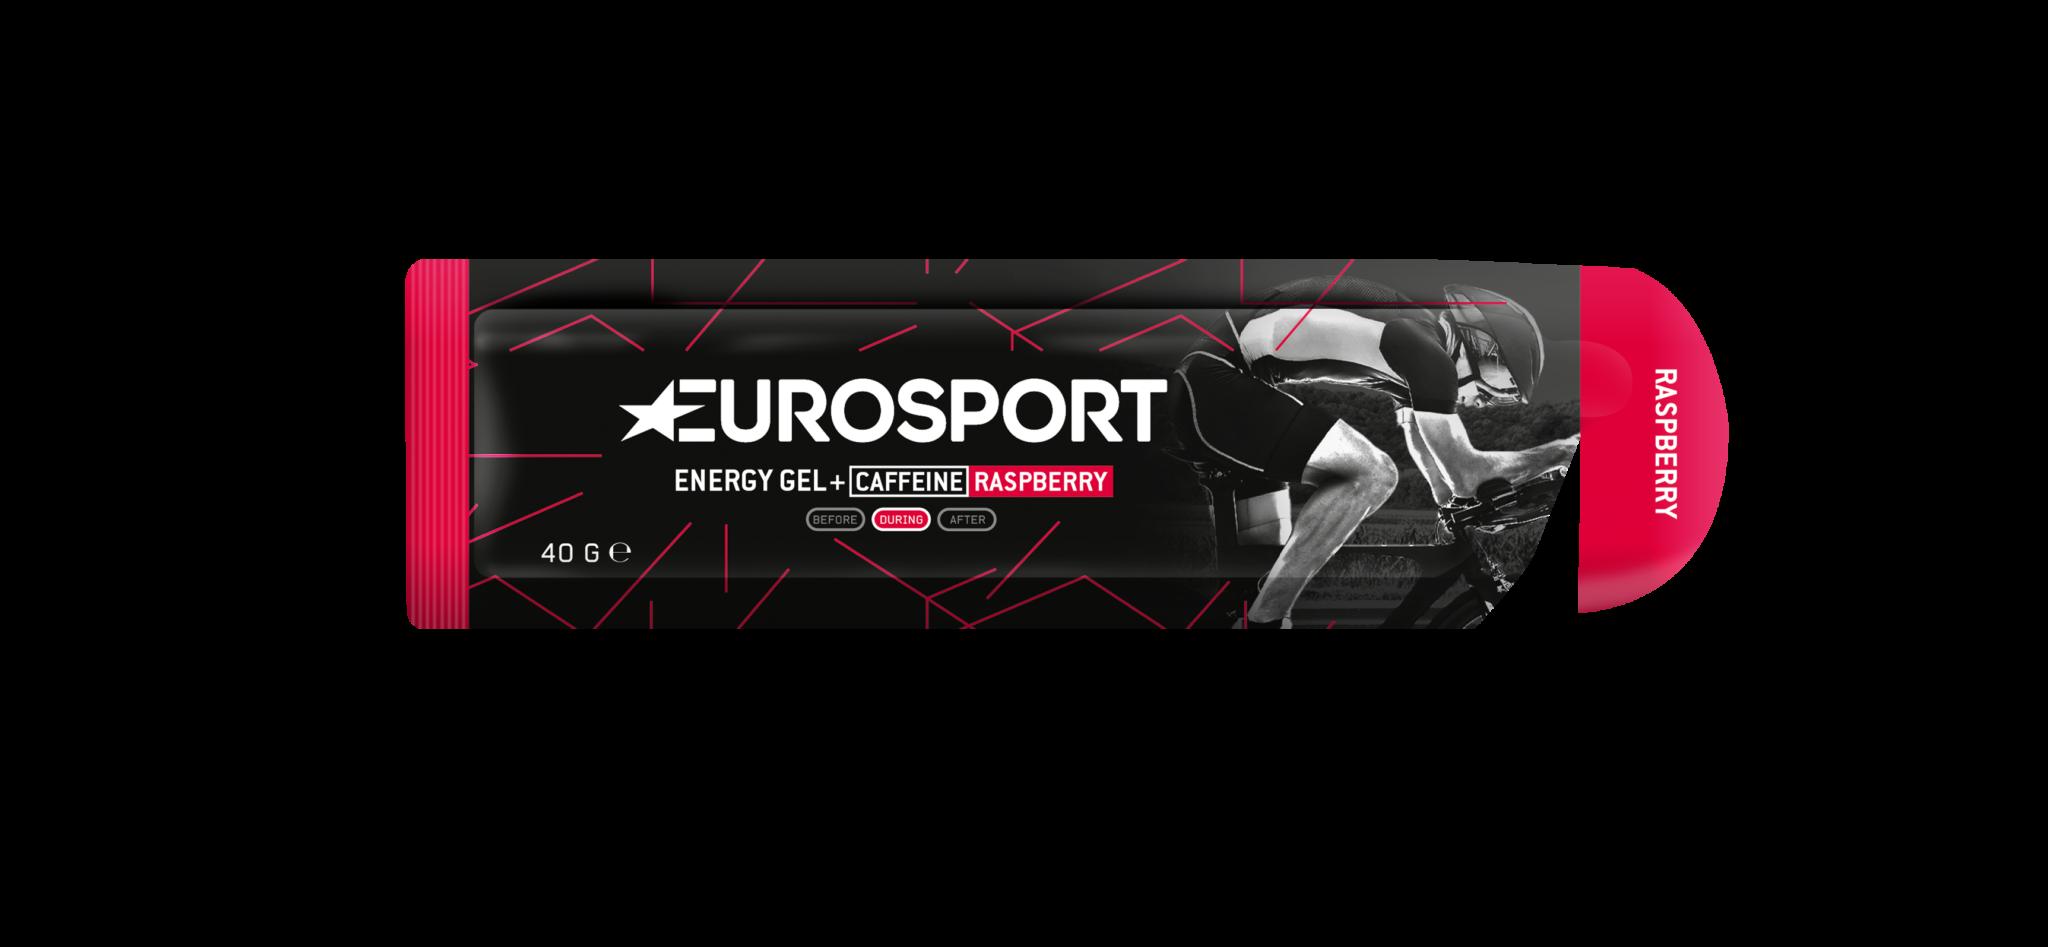 Eurosport - Energy Gel + Caffeine_Raspberry_3D